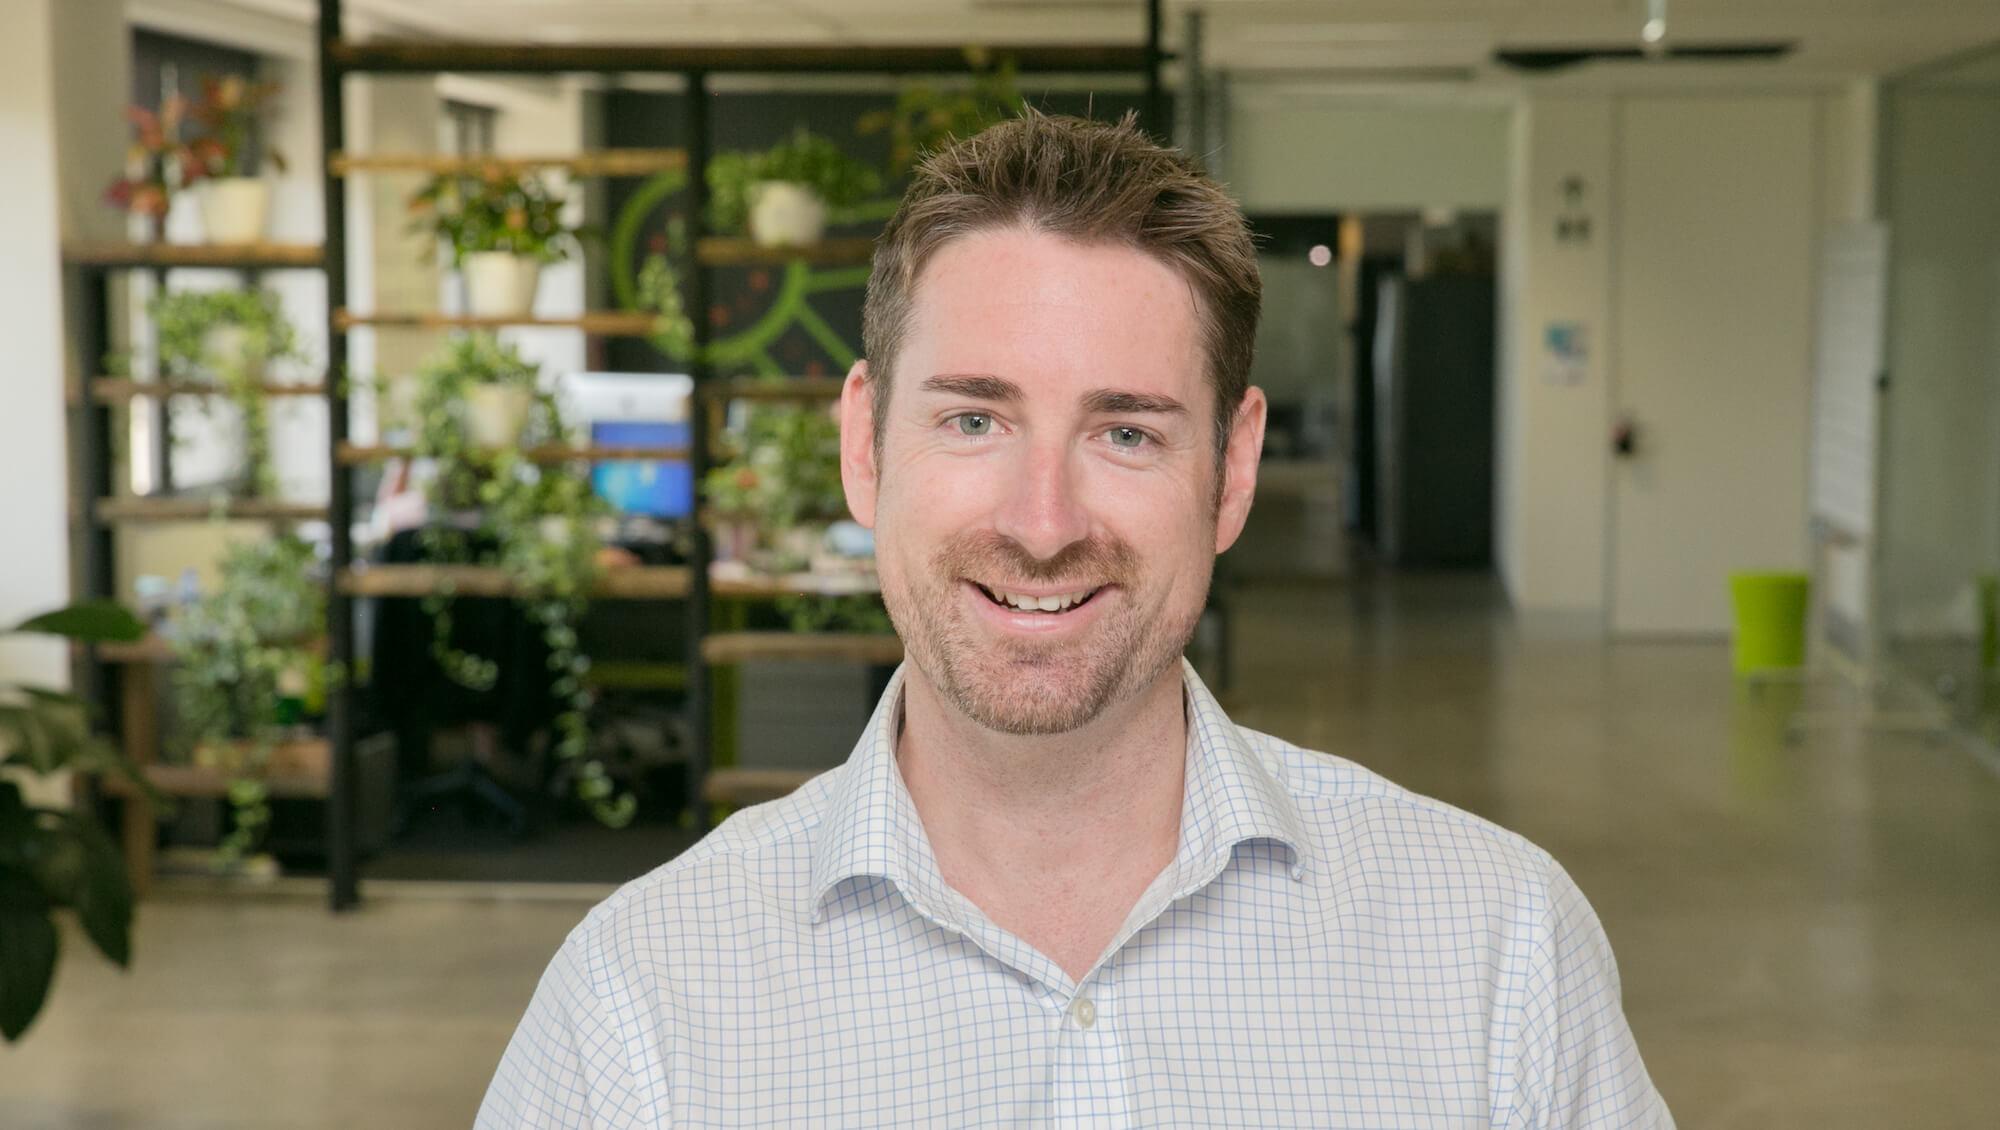 Mark Stewart Skygrow tree planting robots muru-D startup accelerator